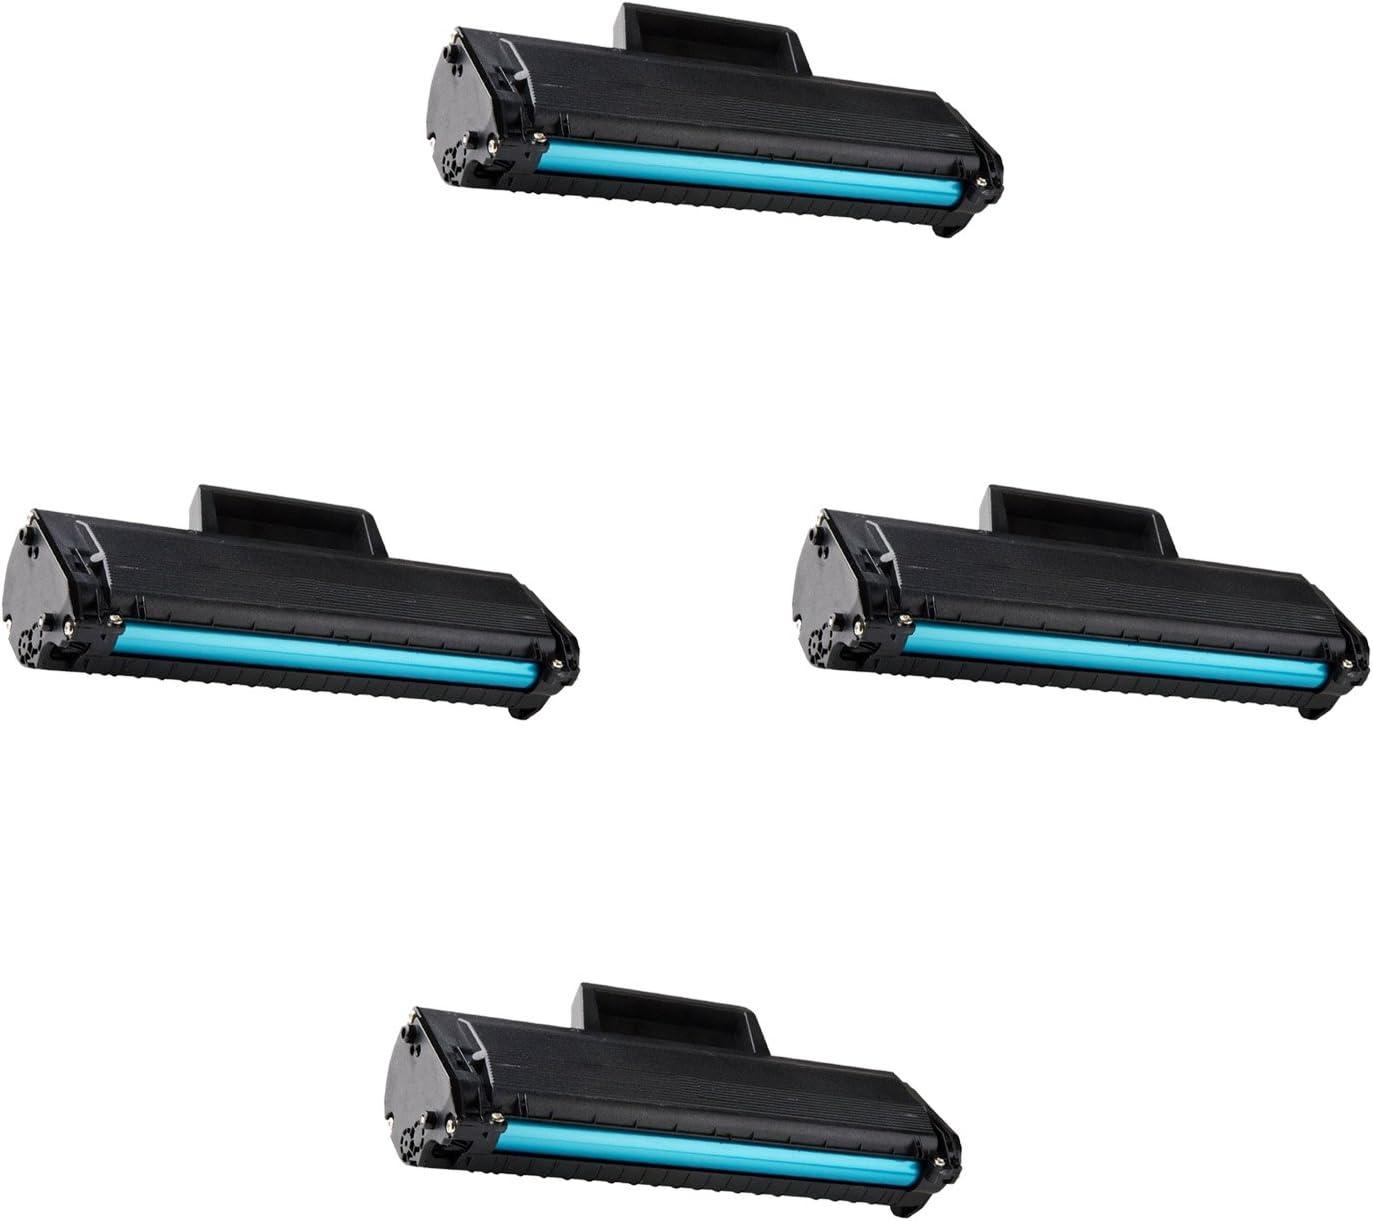 2pk 331-7335 HF442 Black Toner Cartridge for Dell B1165nfw B1160 B1160w Printer